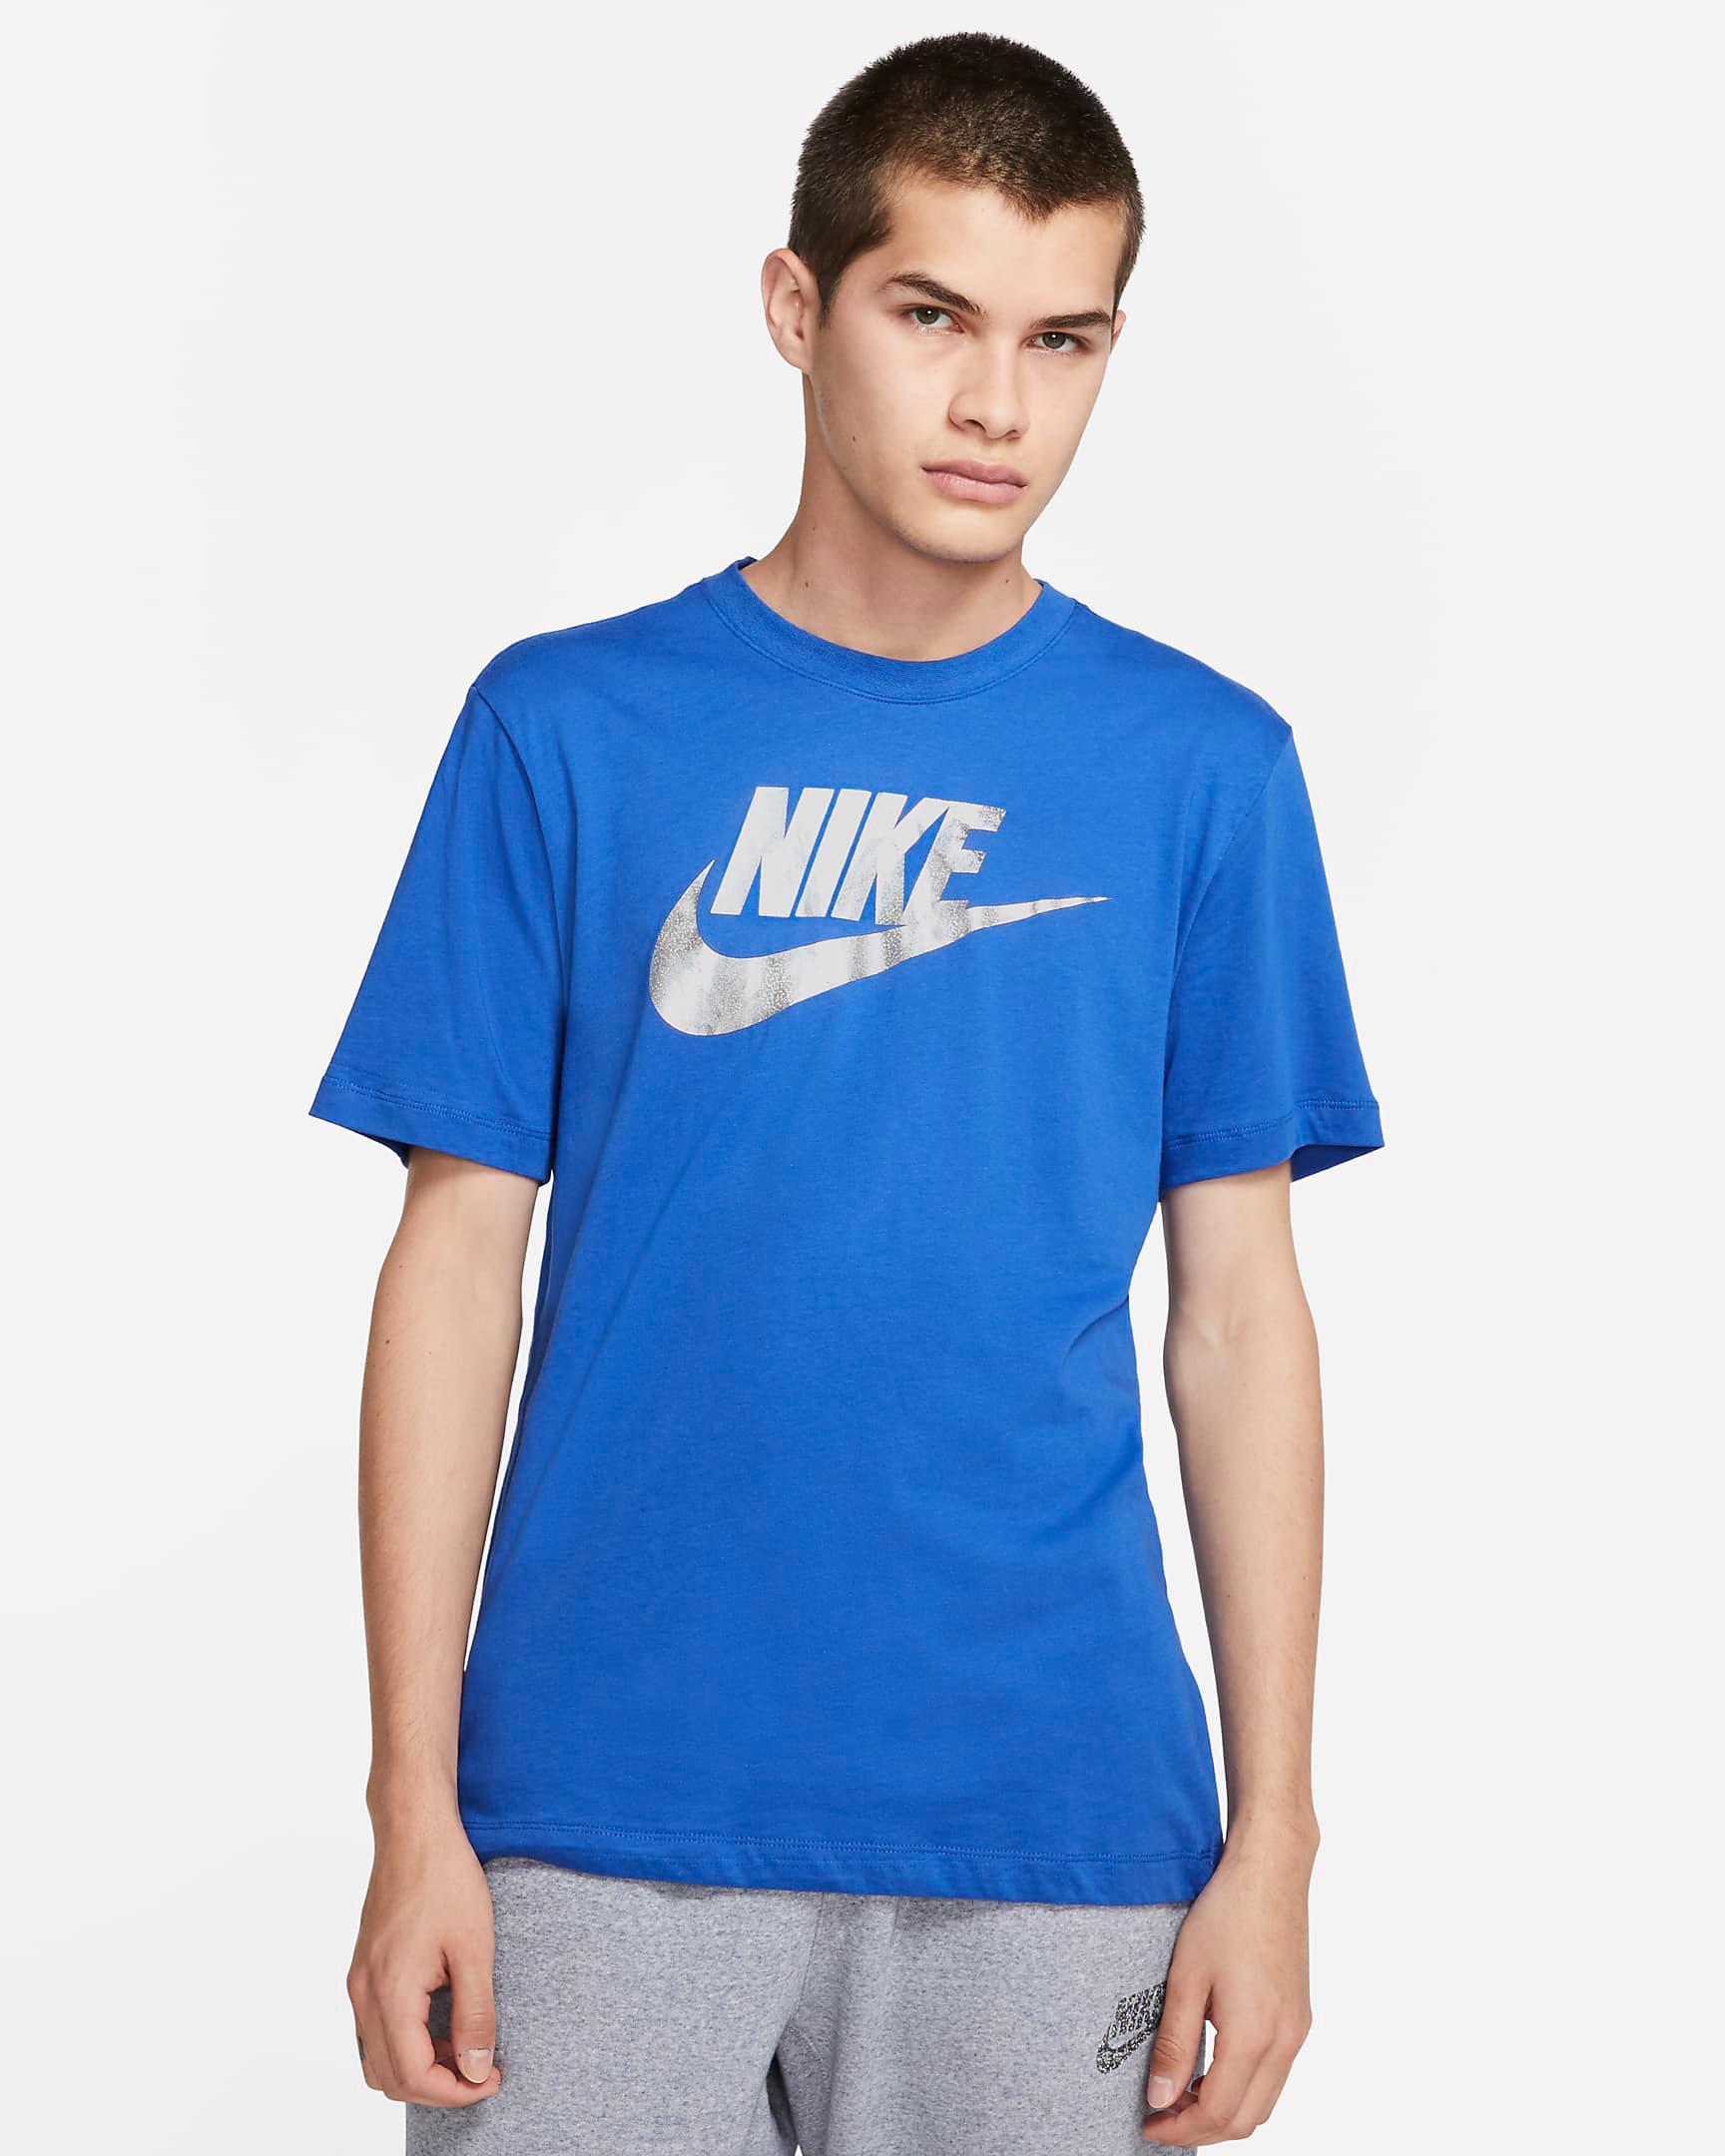 jordan-5-stealth-hyper-royal-nike-shirt